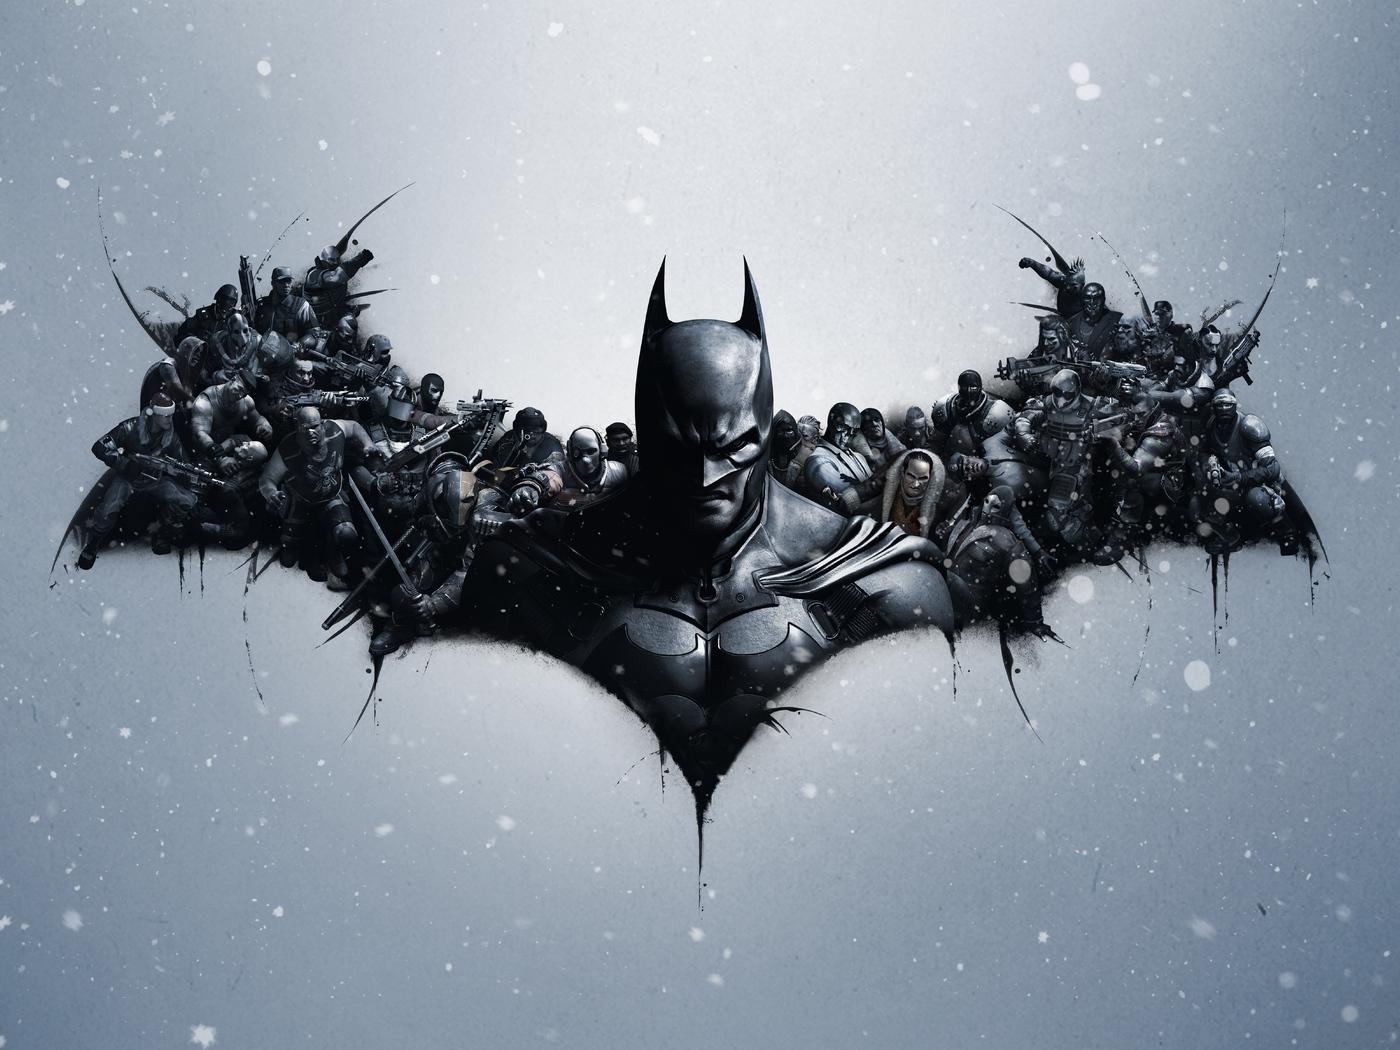 batman-arkham-origins-logo-8k-xb.jpg